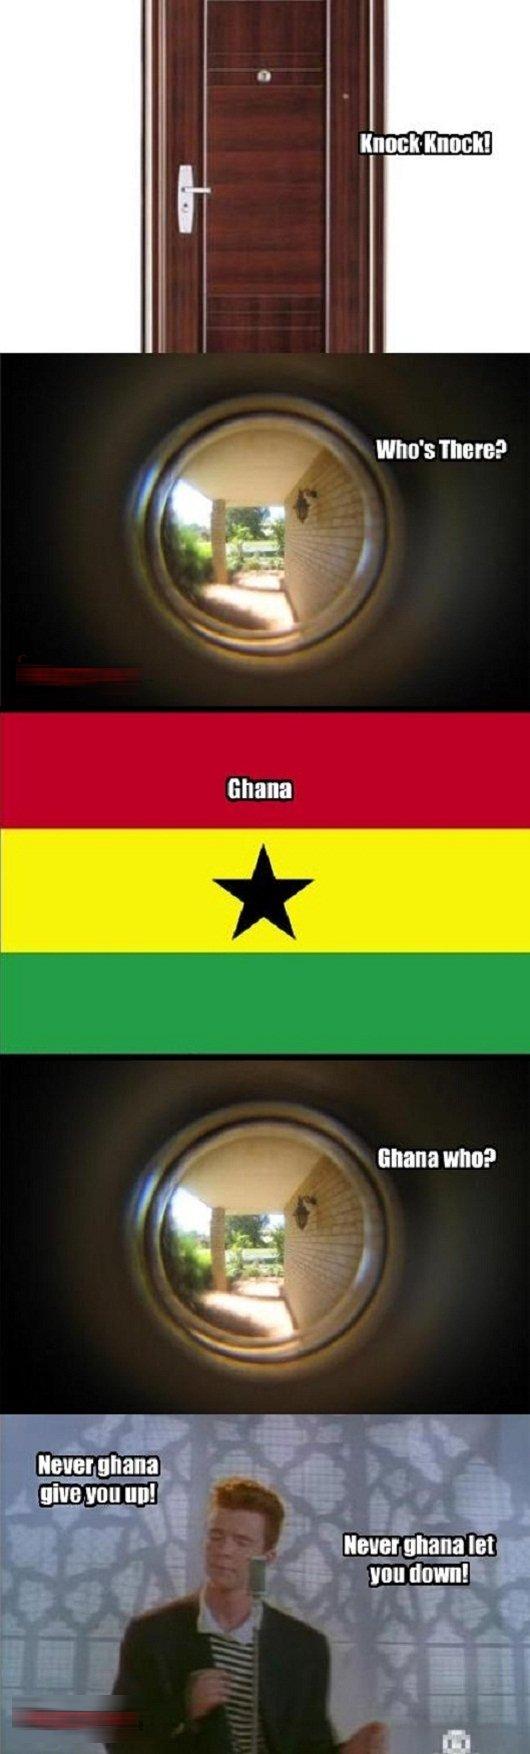 Knock knock!. . Who': There? lall,! Brana Ghana who? ghana. let. you sly ... rick roll knock